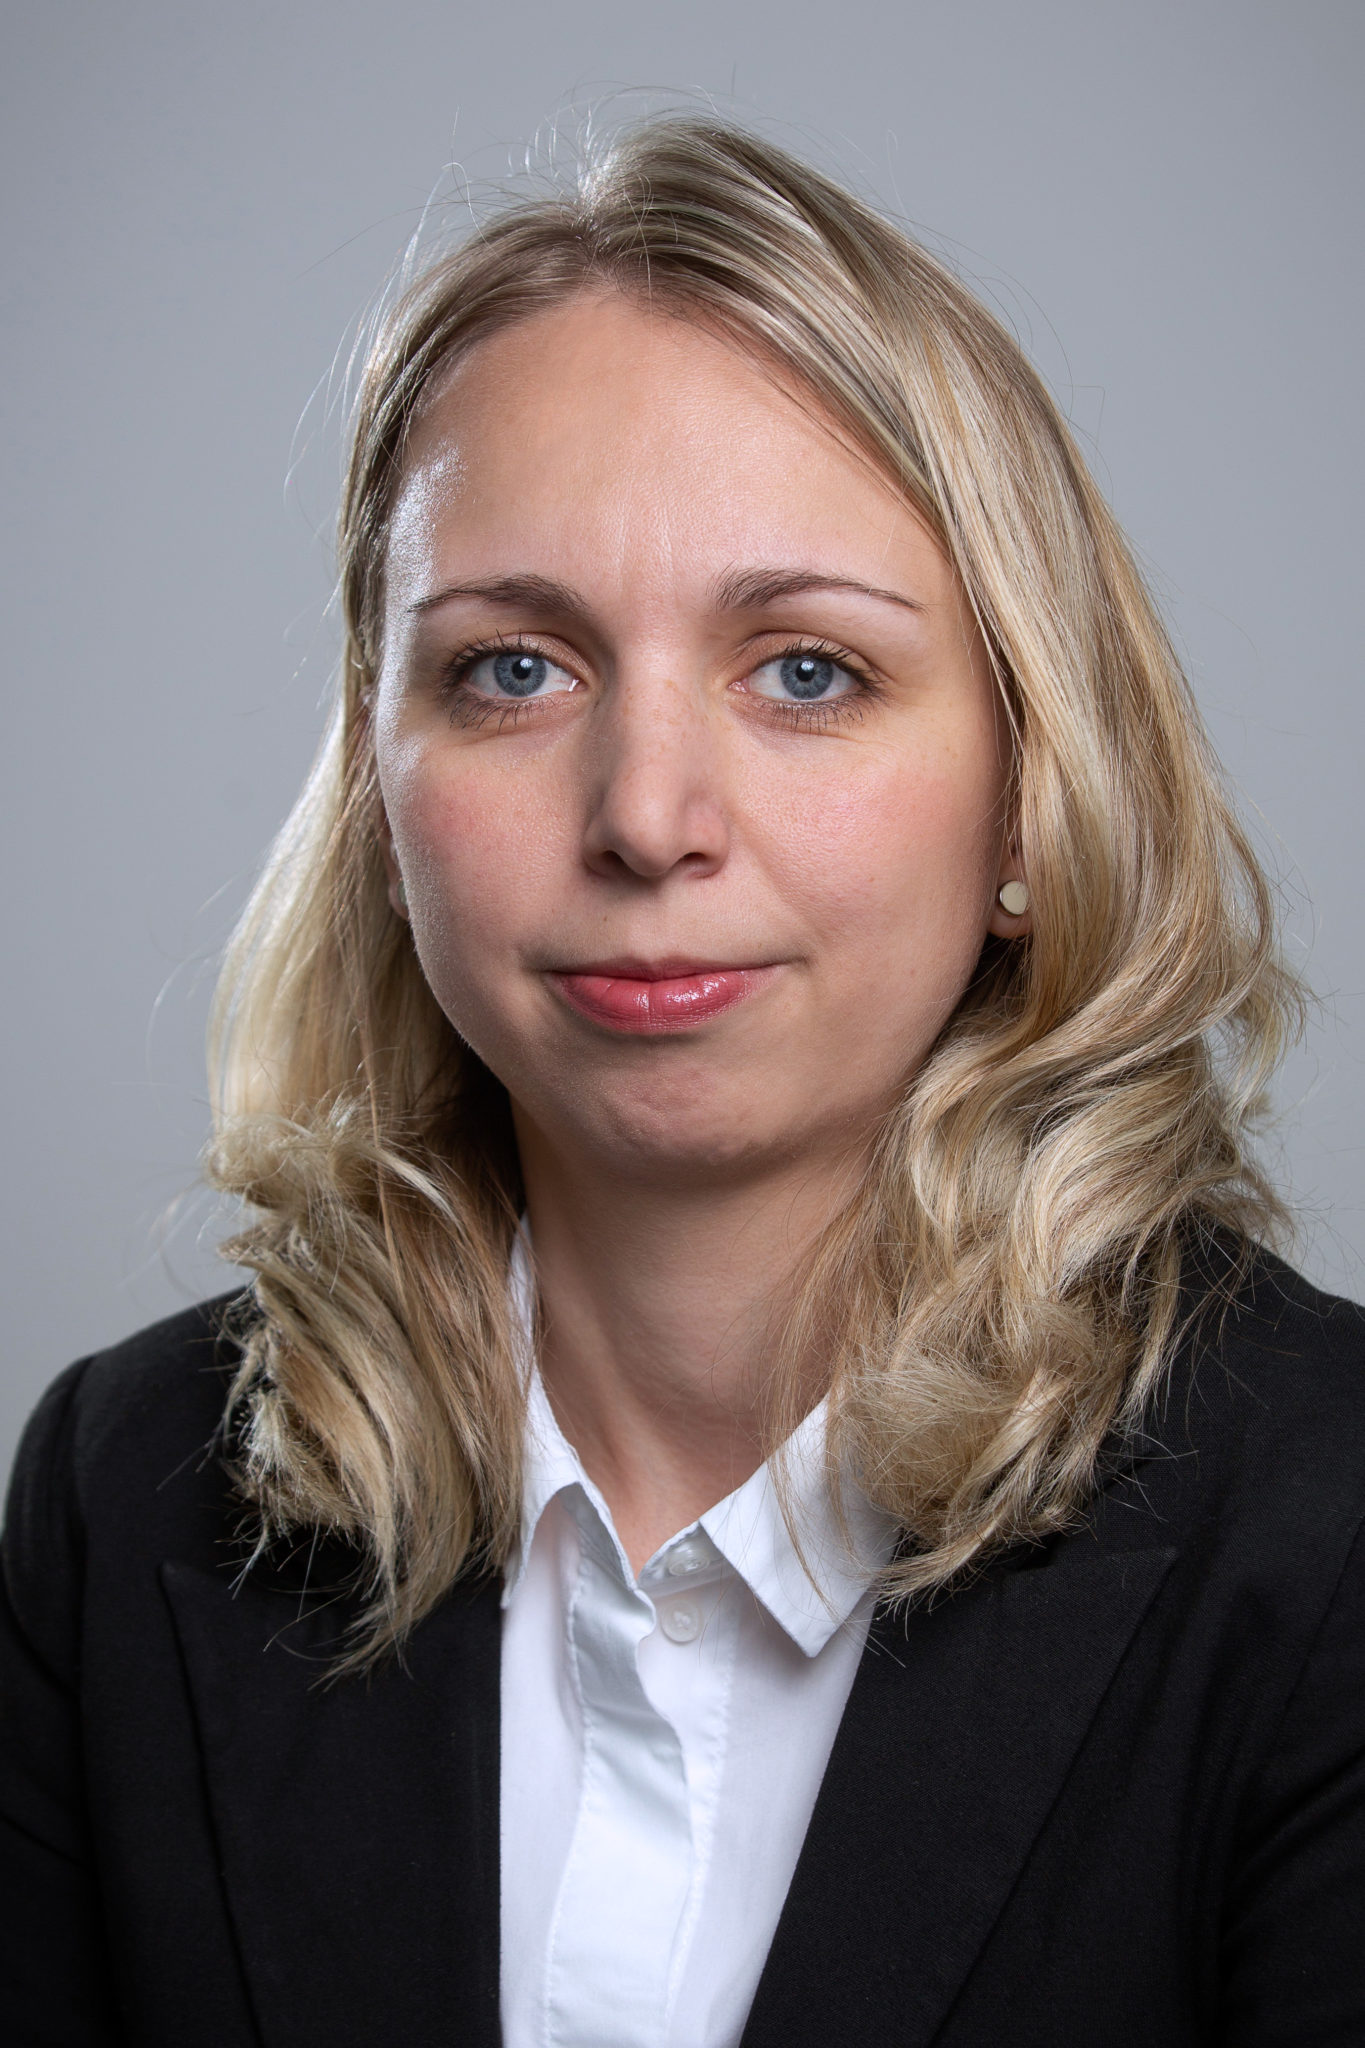 Krisztina Jekkel